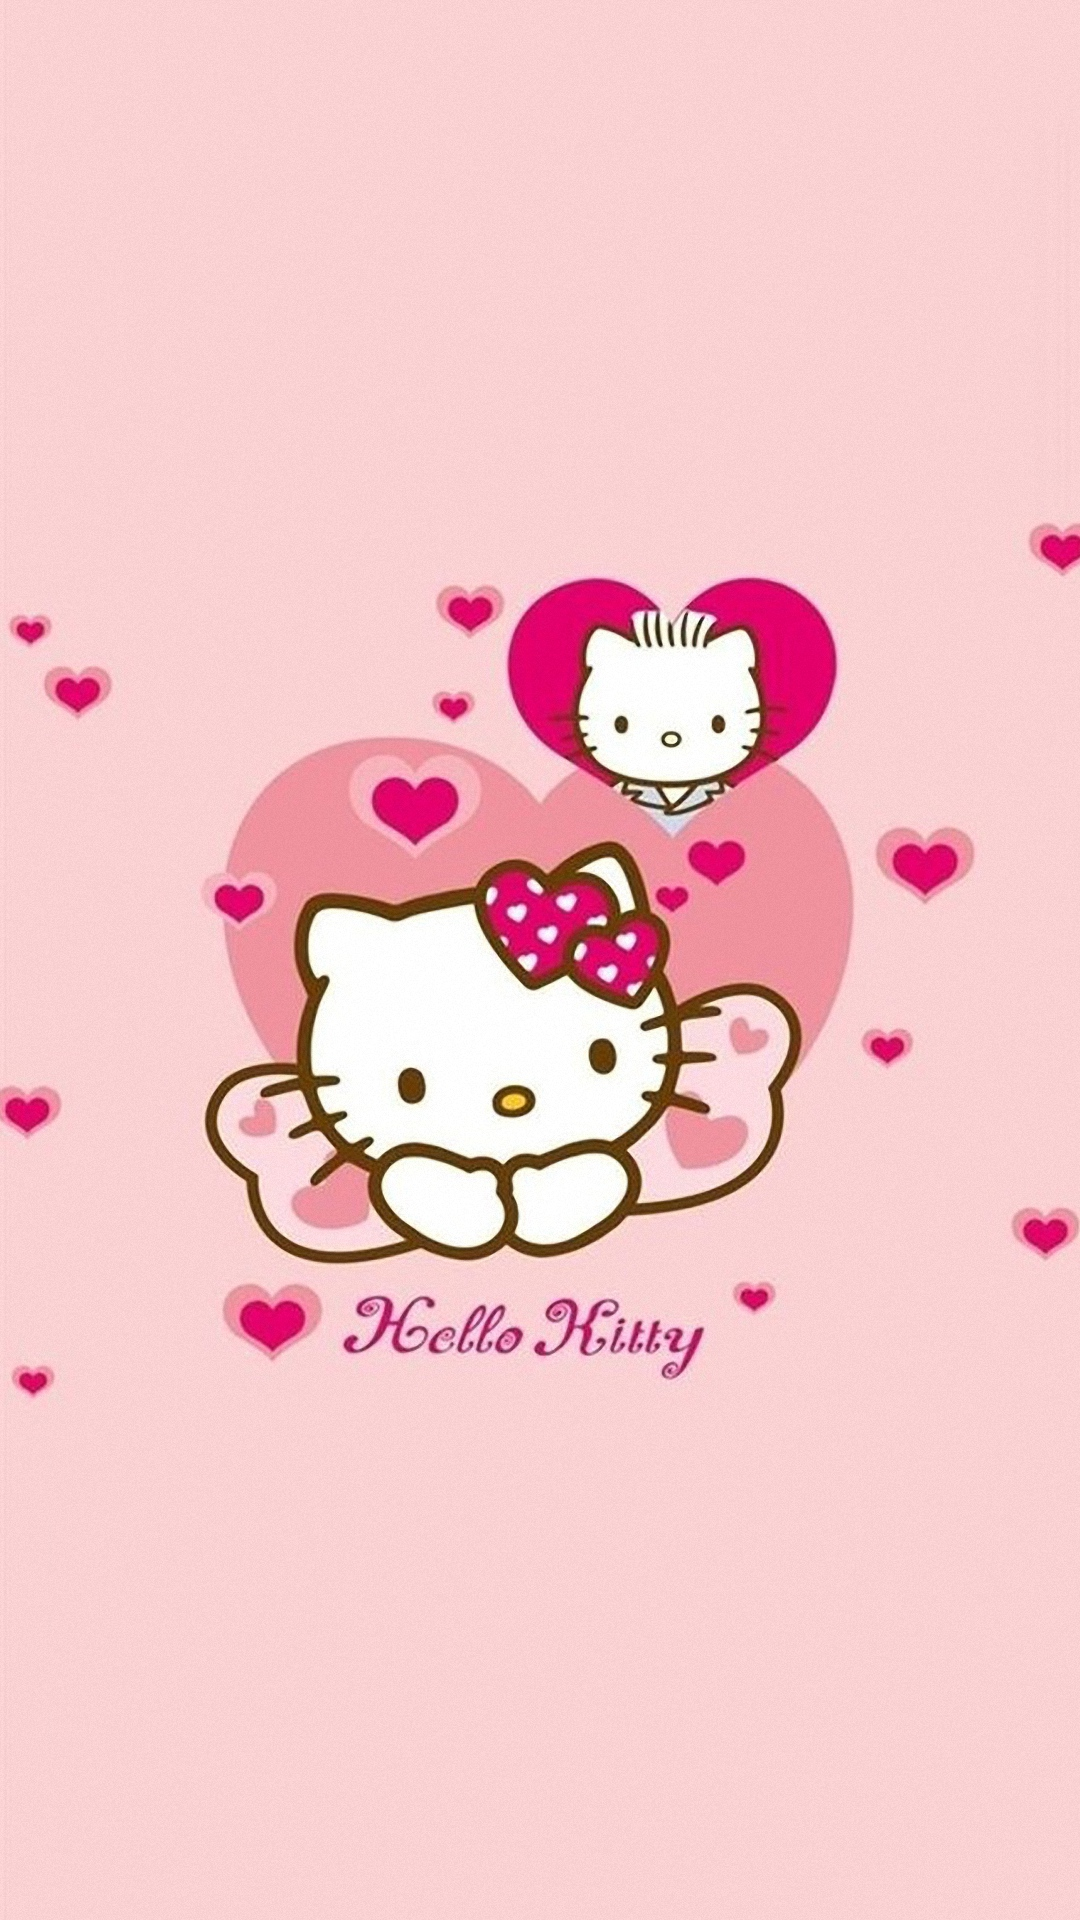 Wallpaper De Hello Kitty Posted By Ethan Peltier